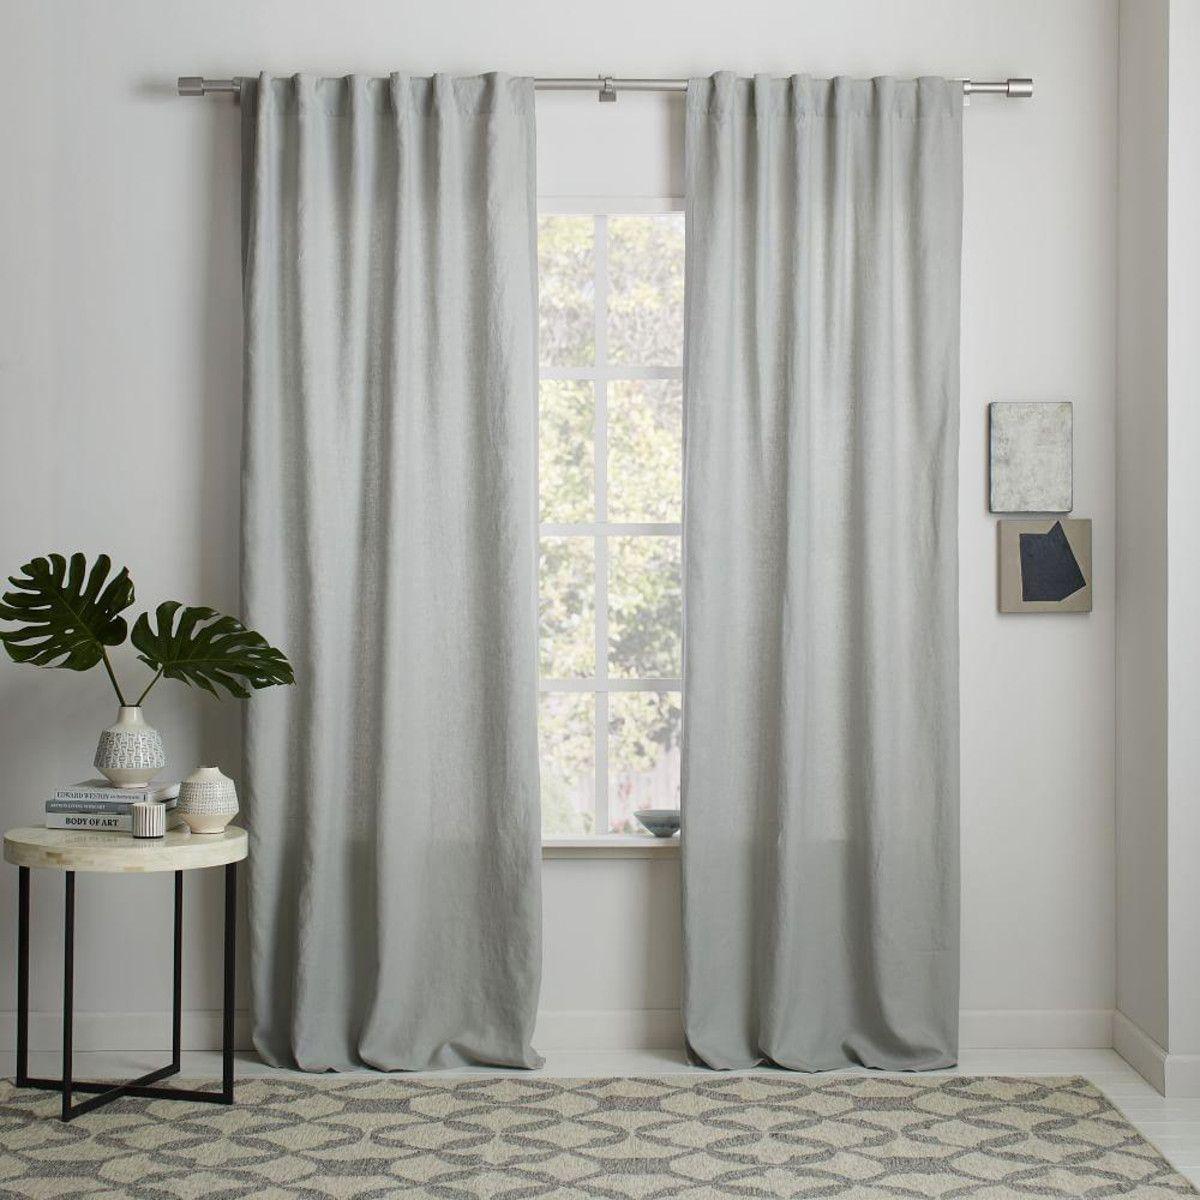 Belgian Flax Linen Curtain Blackout Lining Platinum West Elm